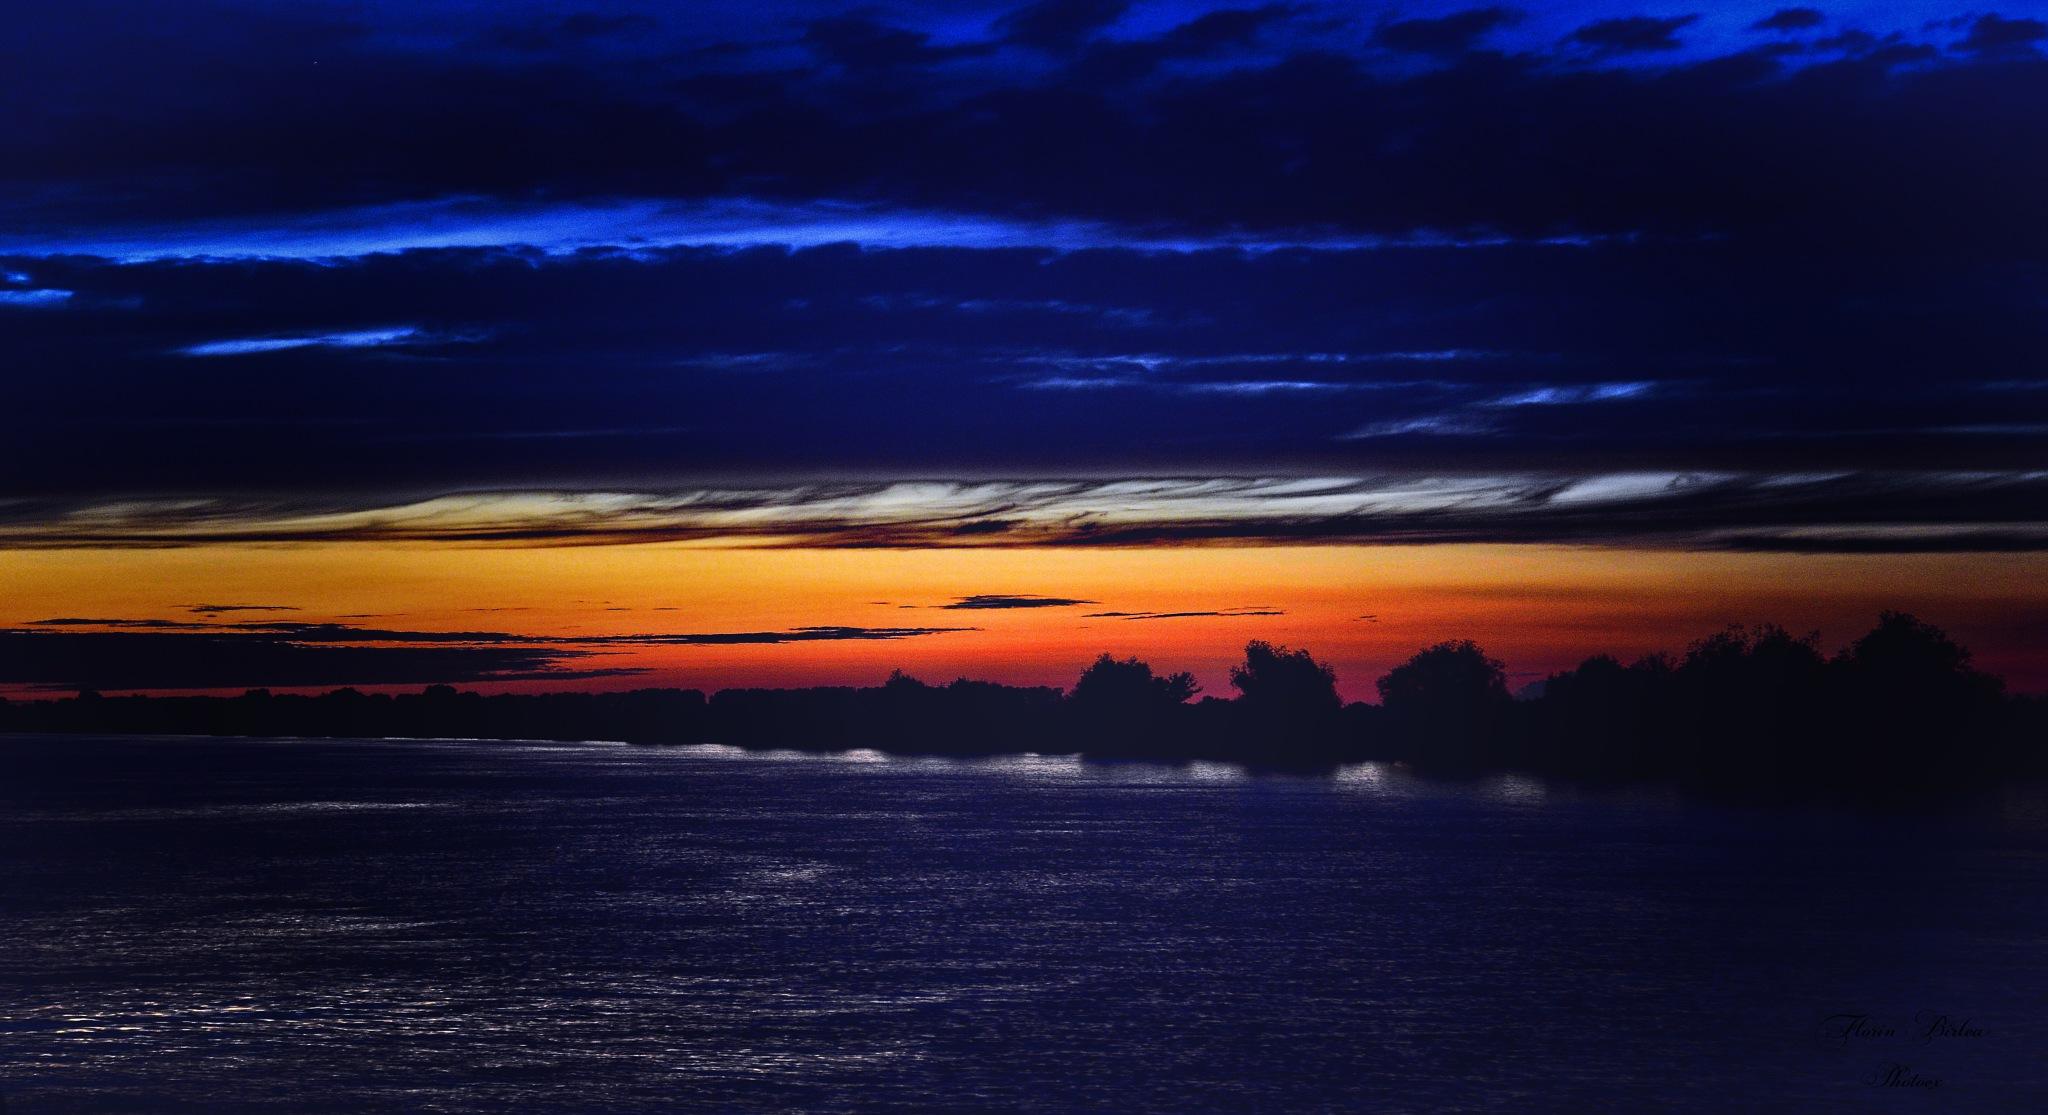 Sunset_47 by Florian B